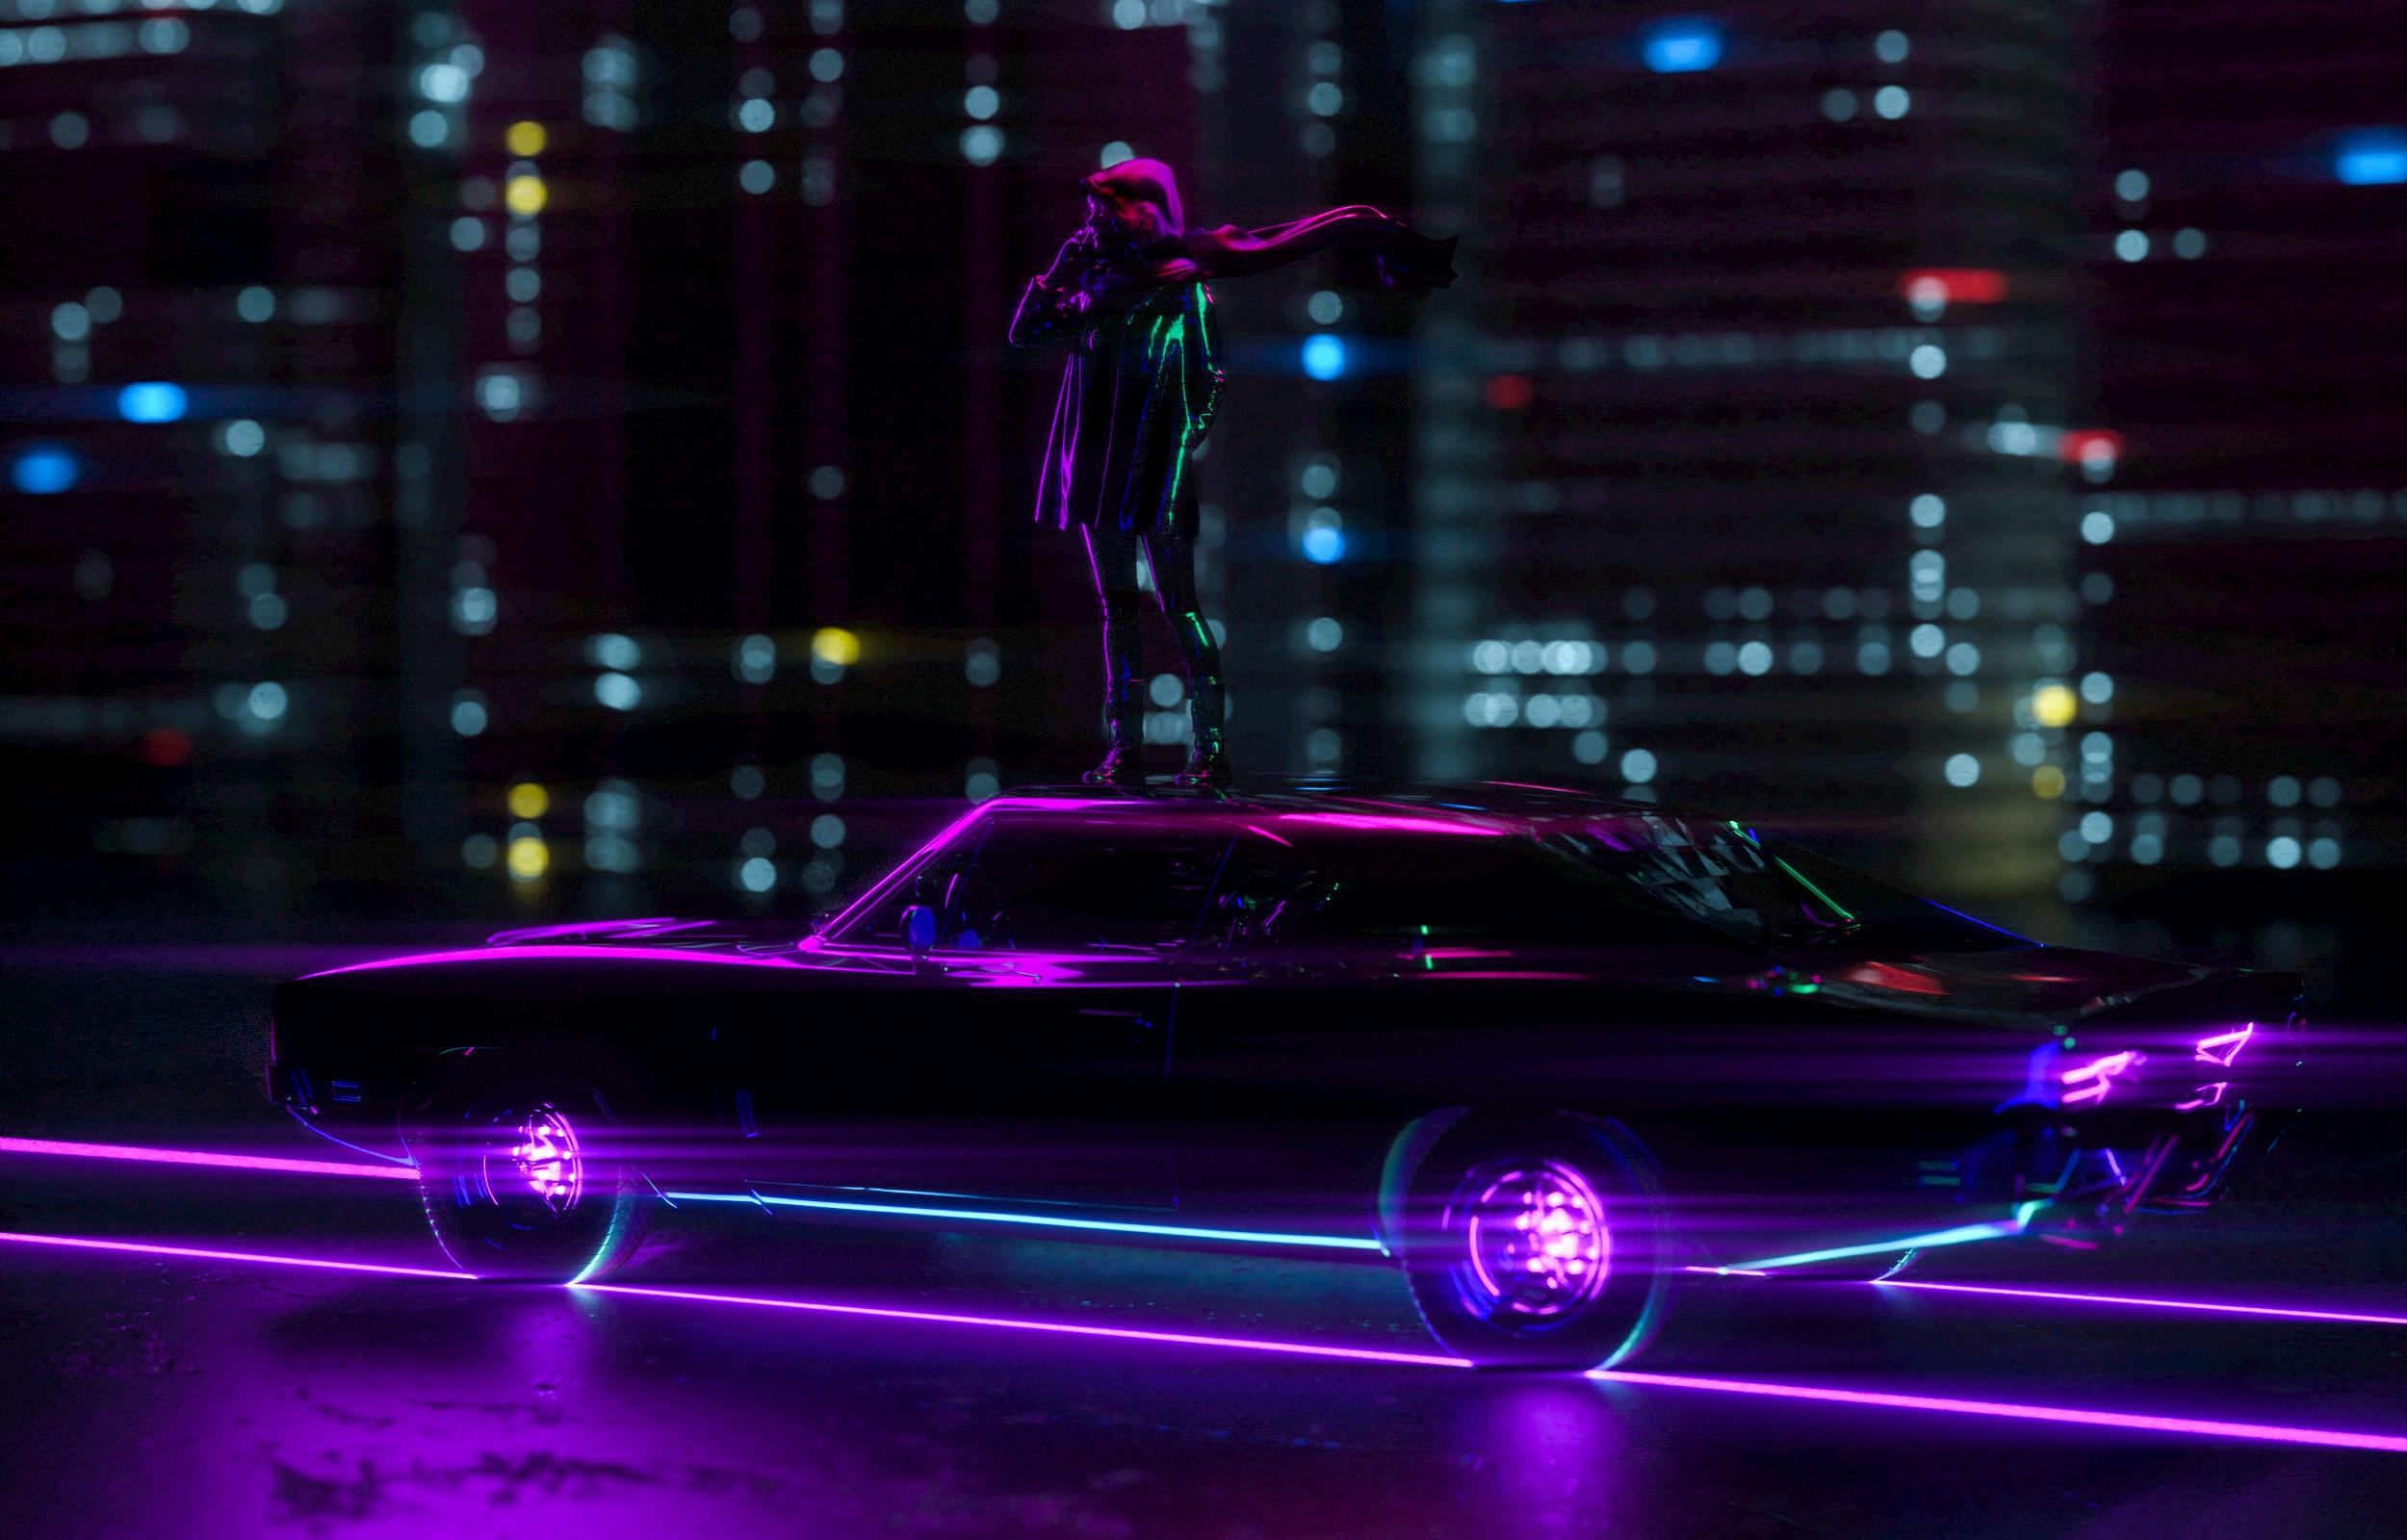 Wallpaper Neon Lights Digital Art Artwork Dark Car Vehicle